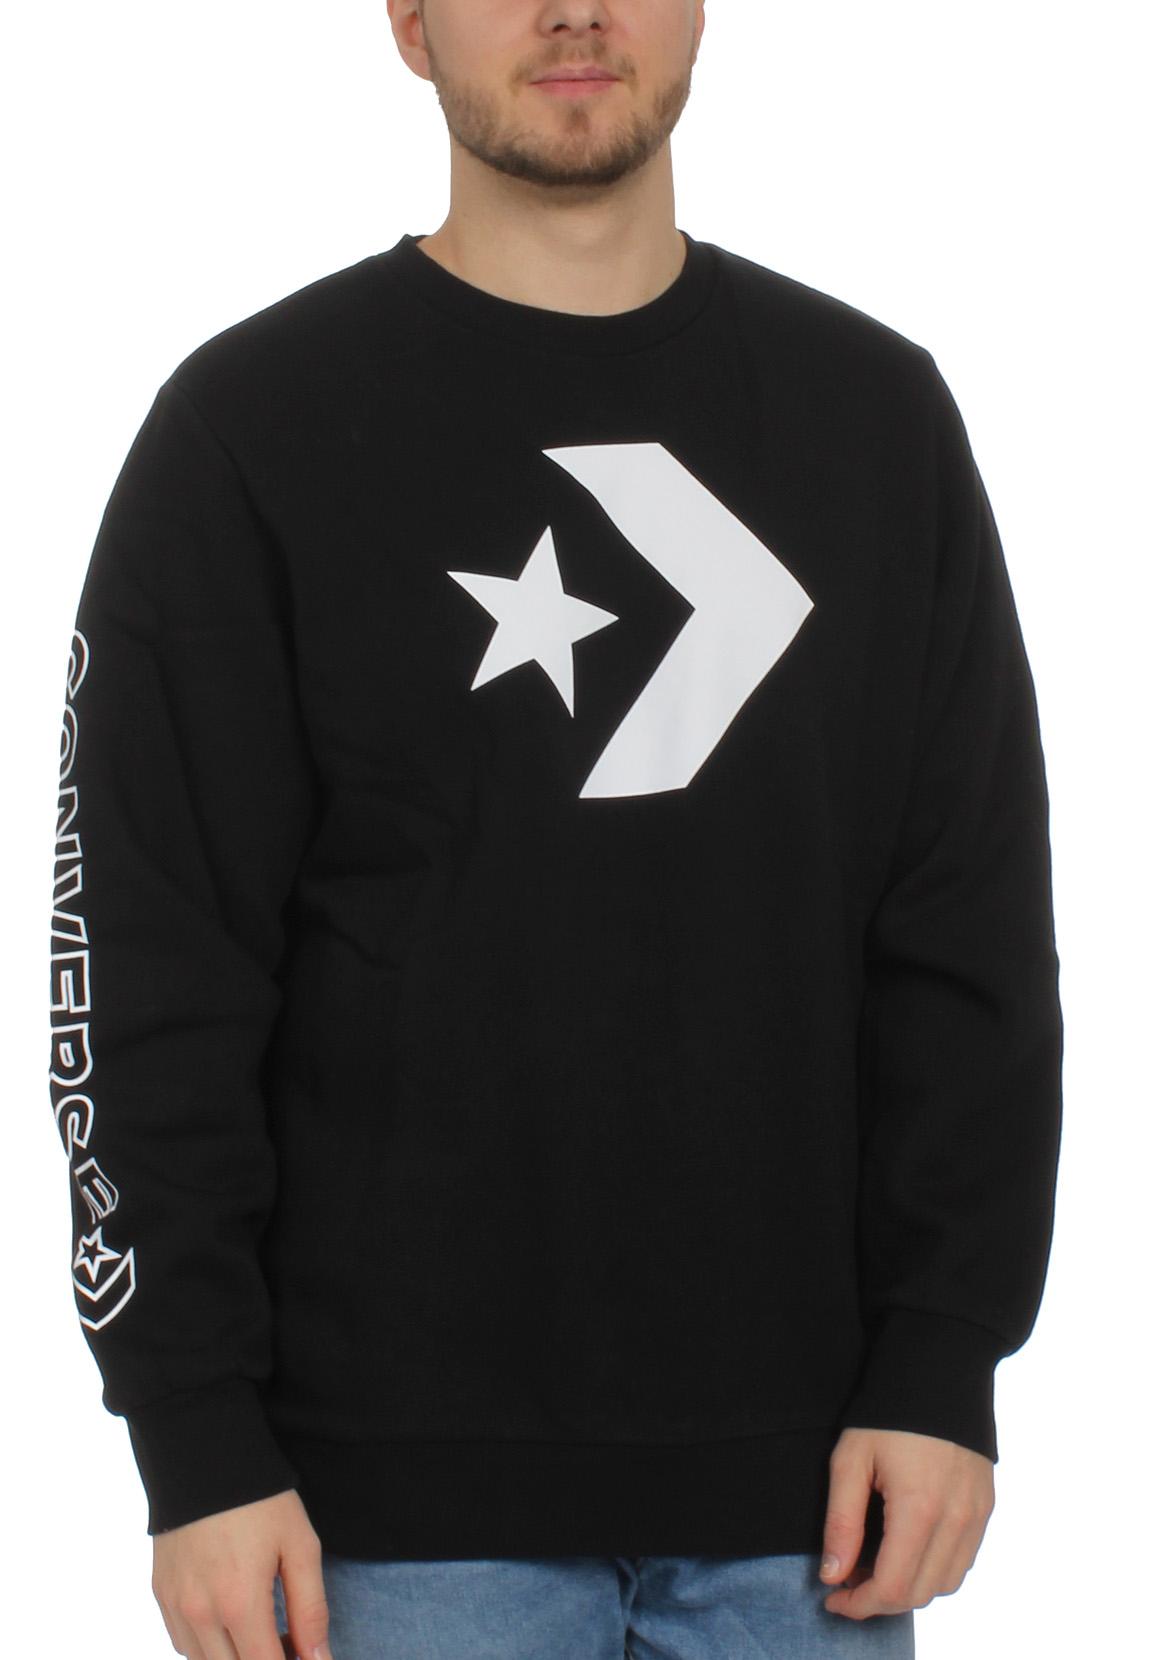 Details about Converse Men's Sweater Star Chevron Graphic Crew 10006434 001 Black